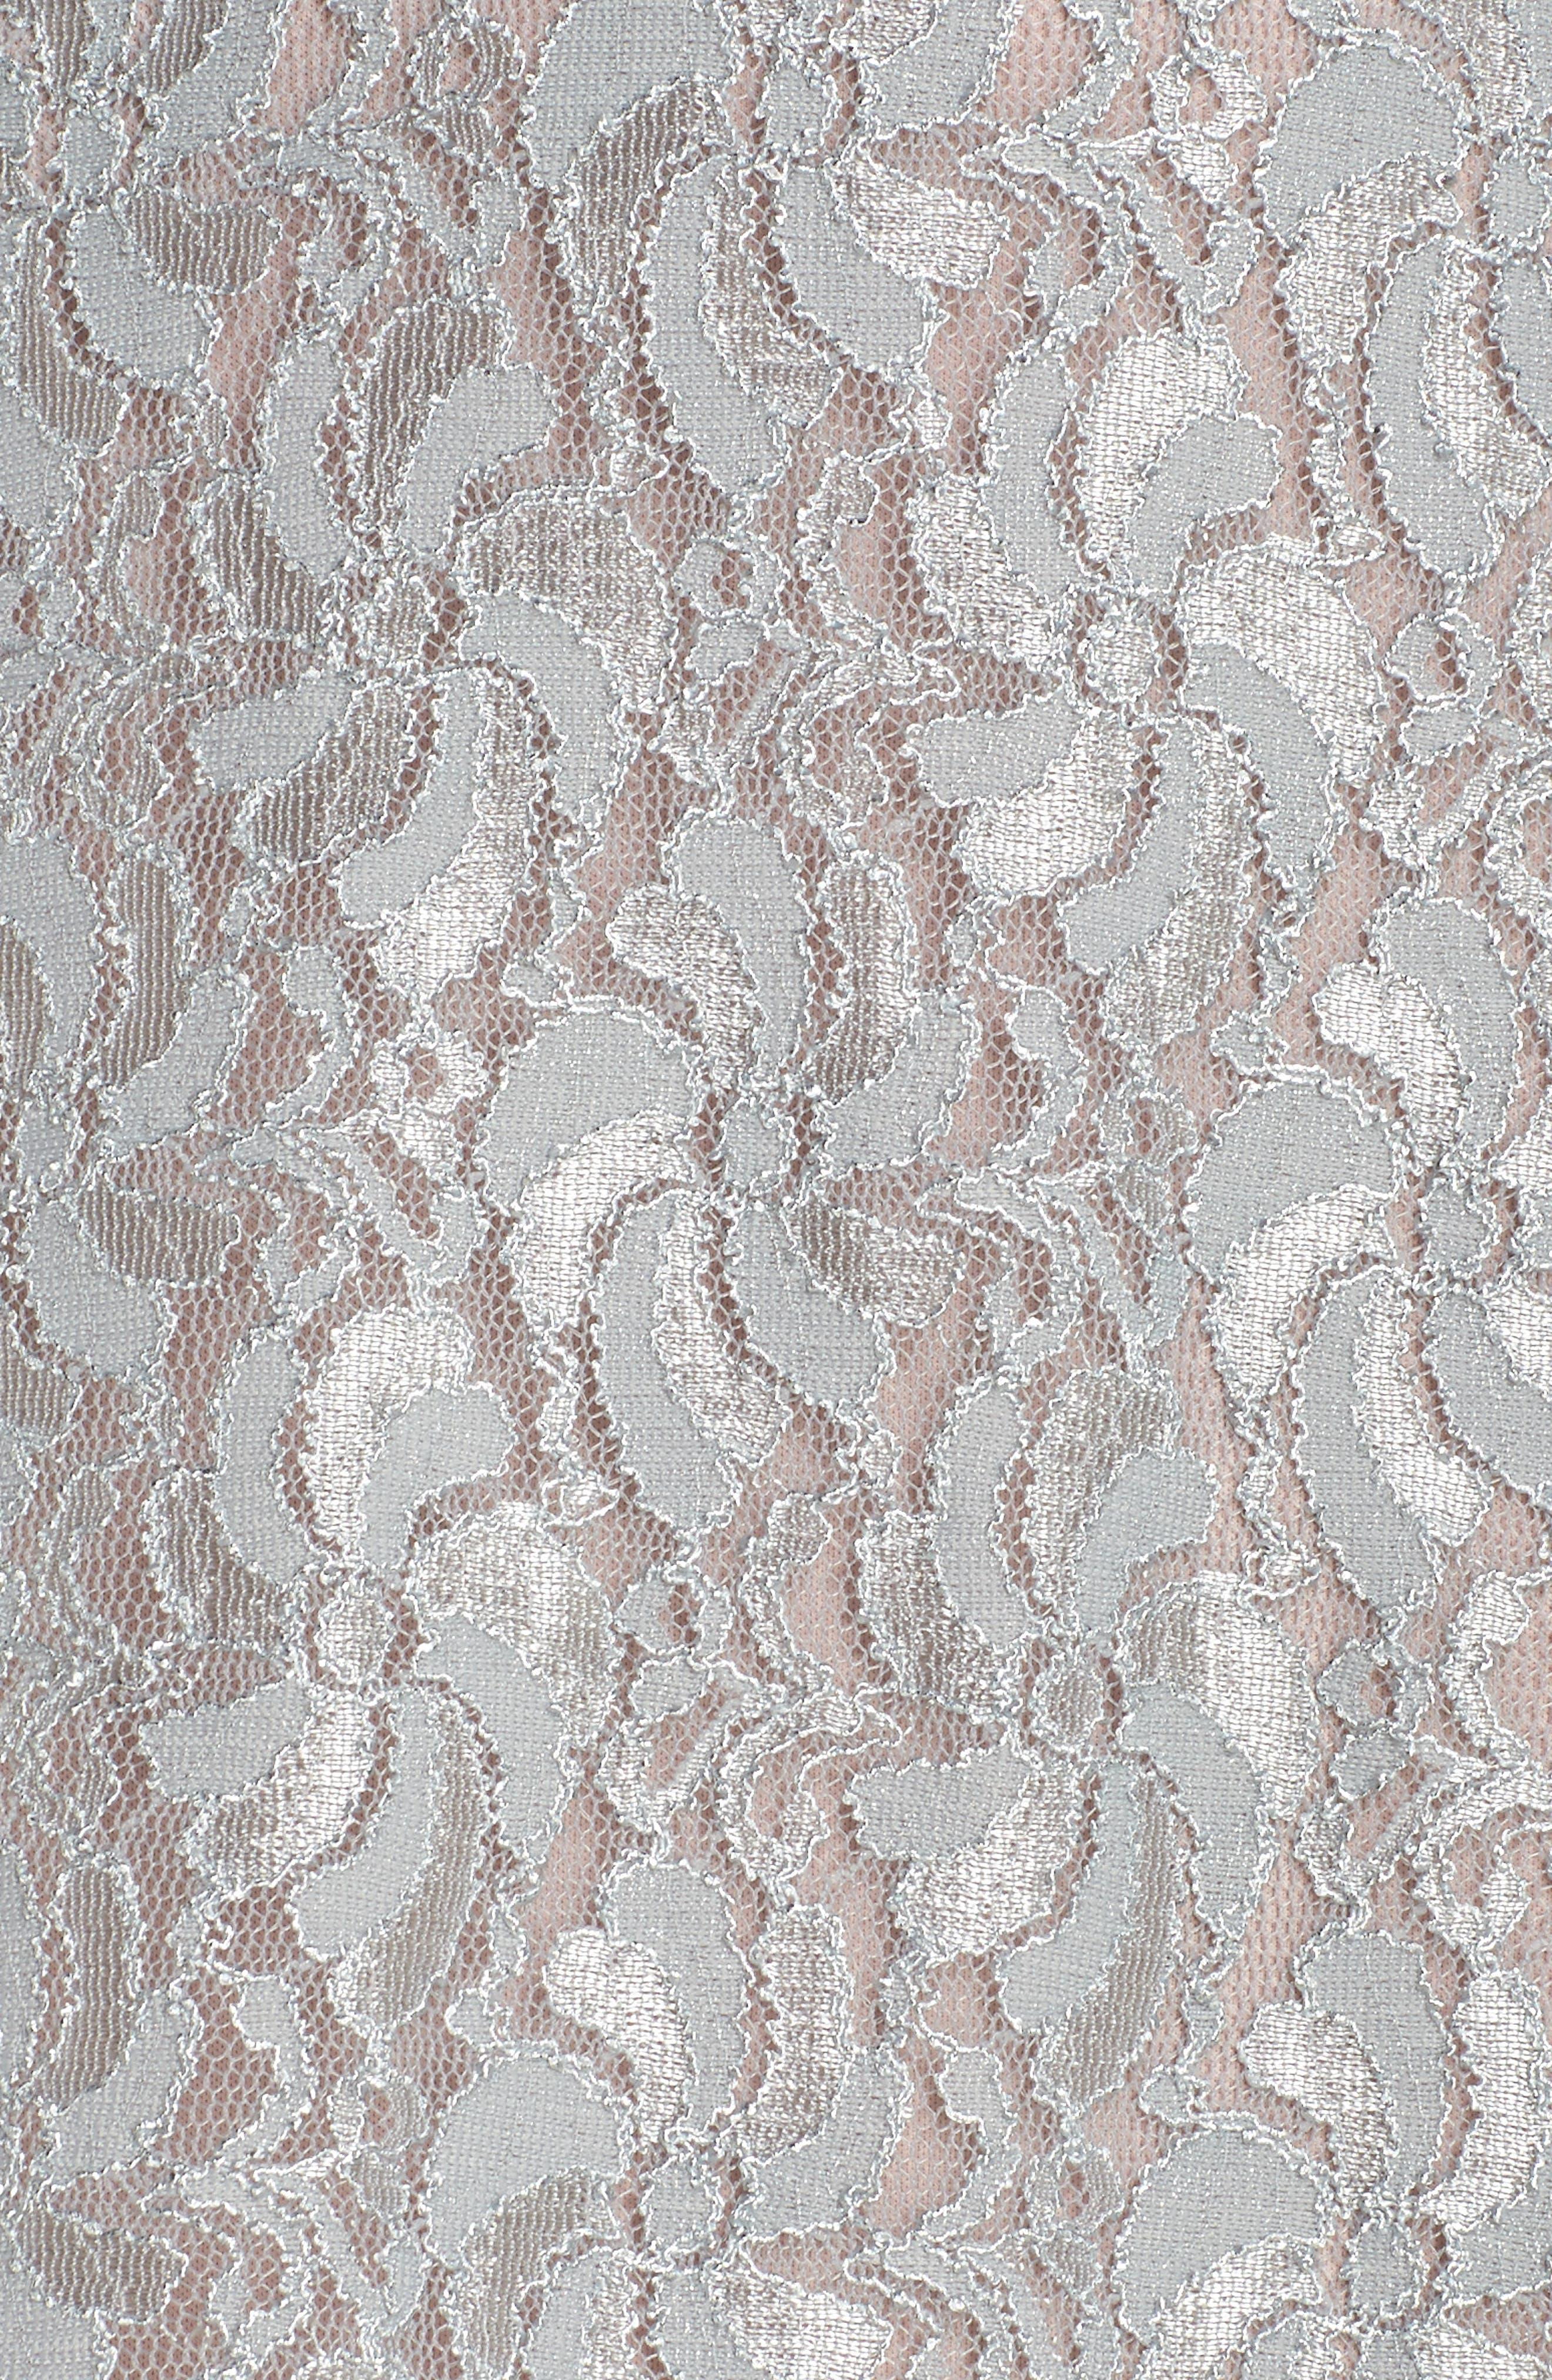 Illusion Waist Lace Fit & Flare Dress,                             Alternate thumbnail 5, color,                             040